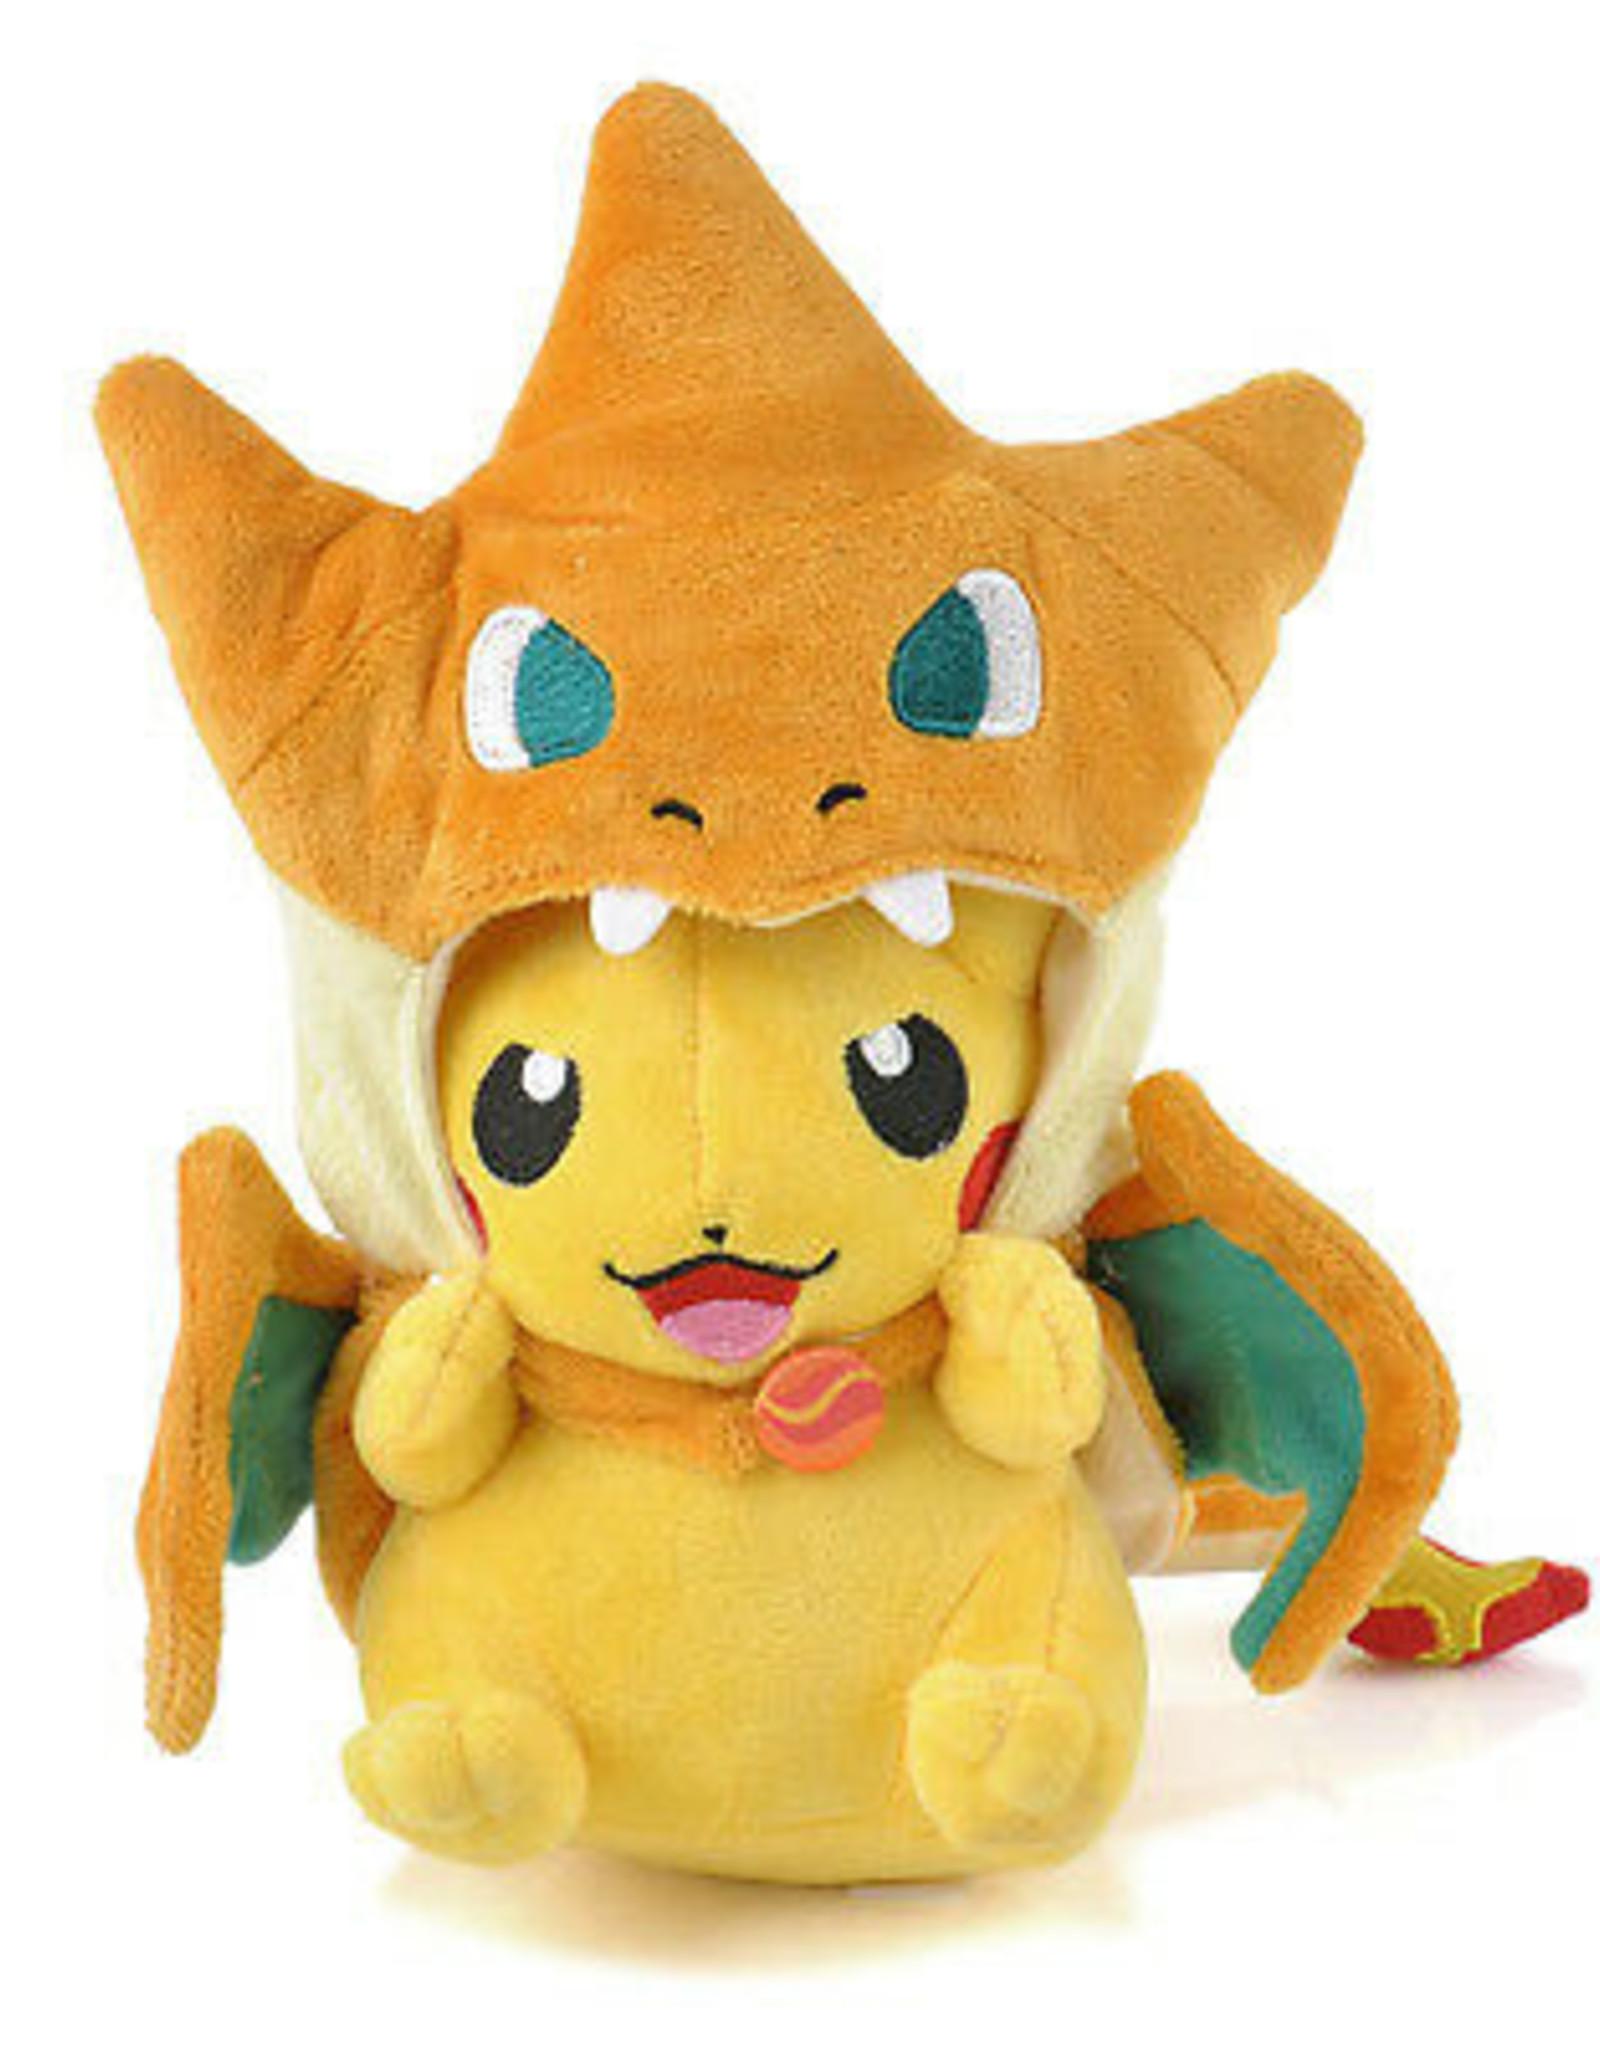 9'' Pokemon Pikachu Charizard Plush Toy